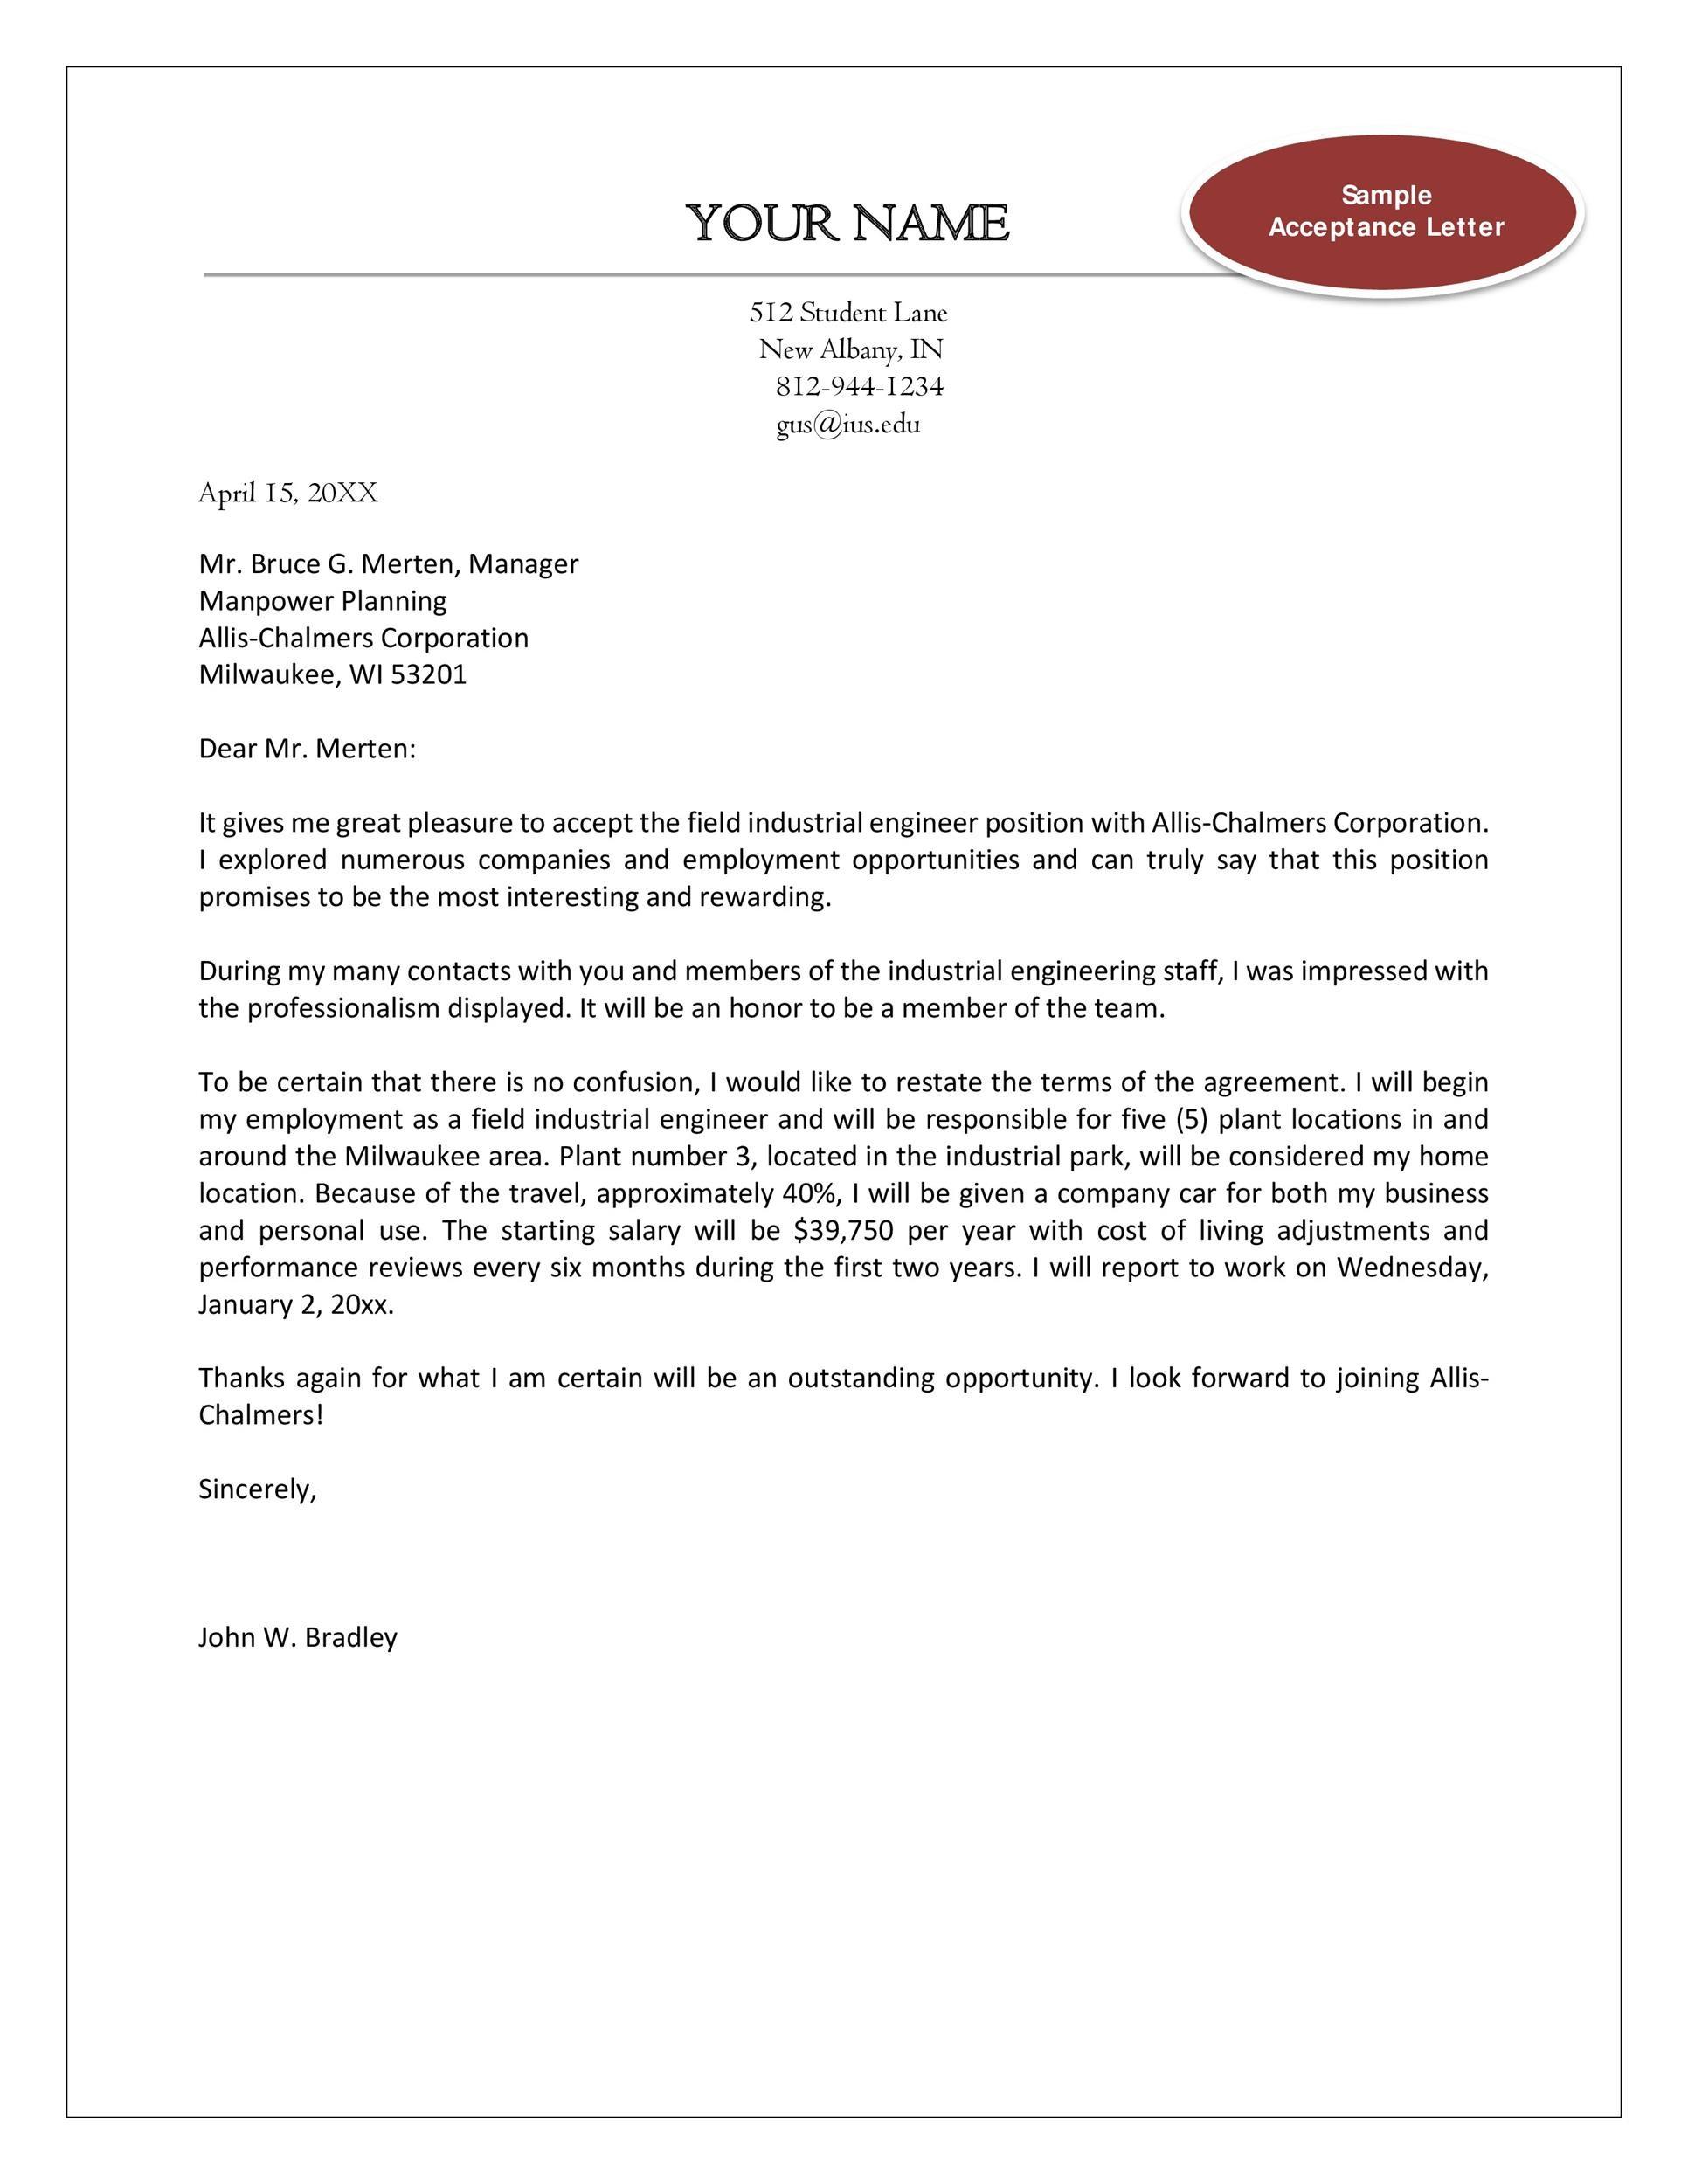 Free job acceptance letter 16